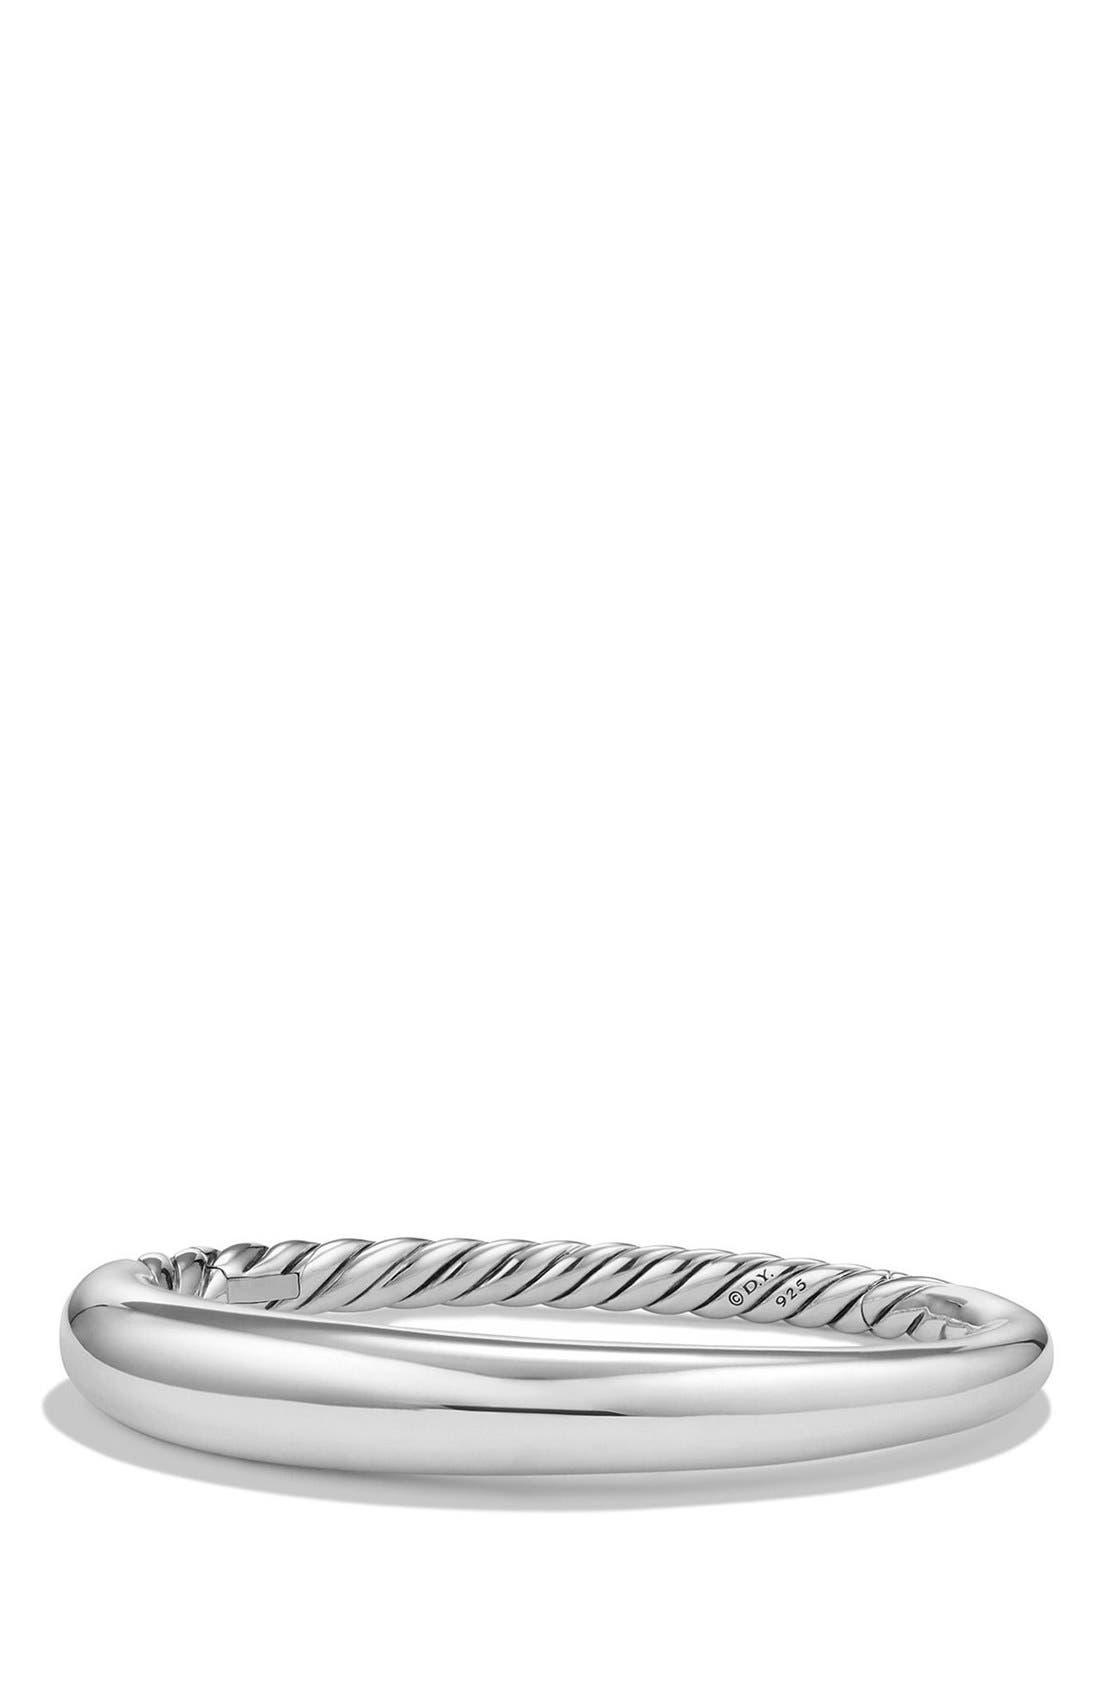 David Yurman 'Pure Form' Small Sterling Silver Bracelet